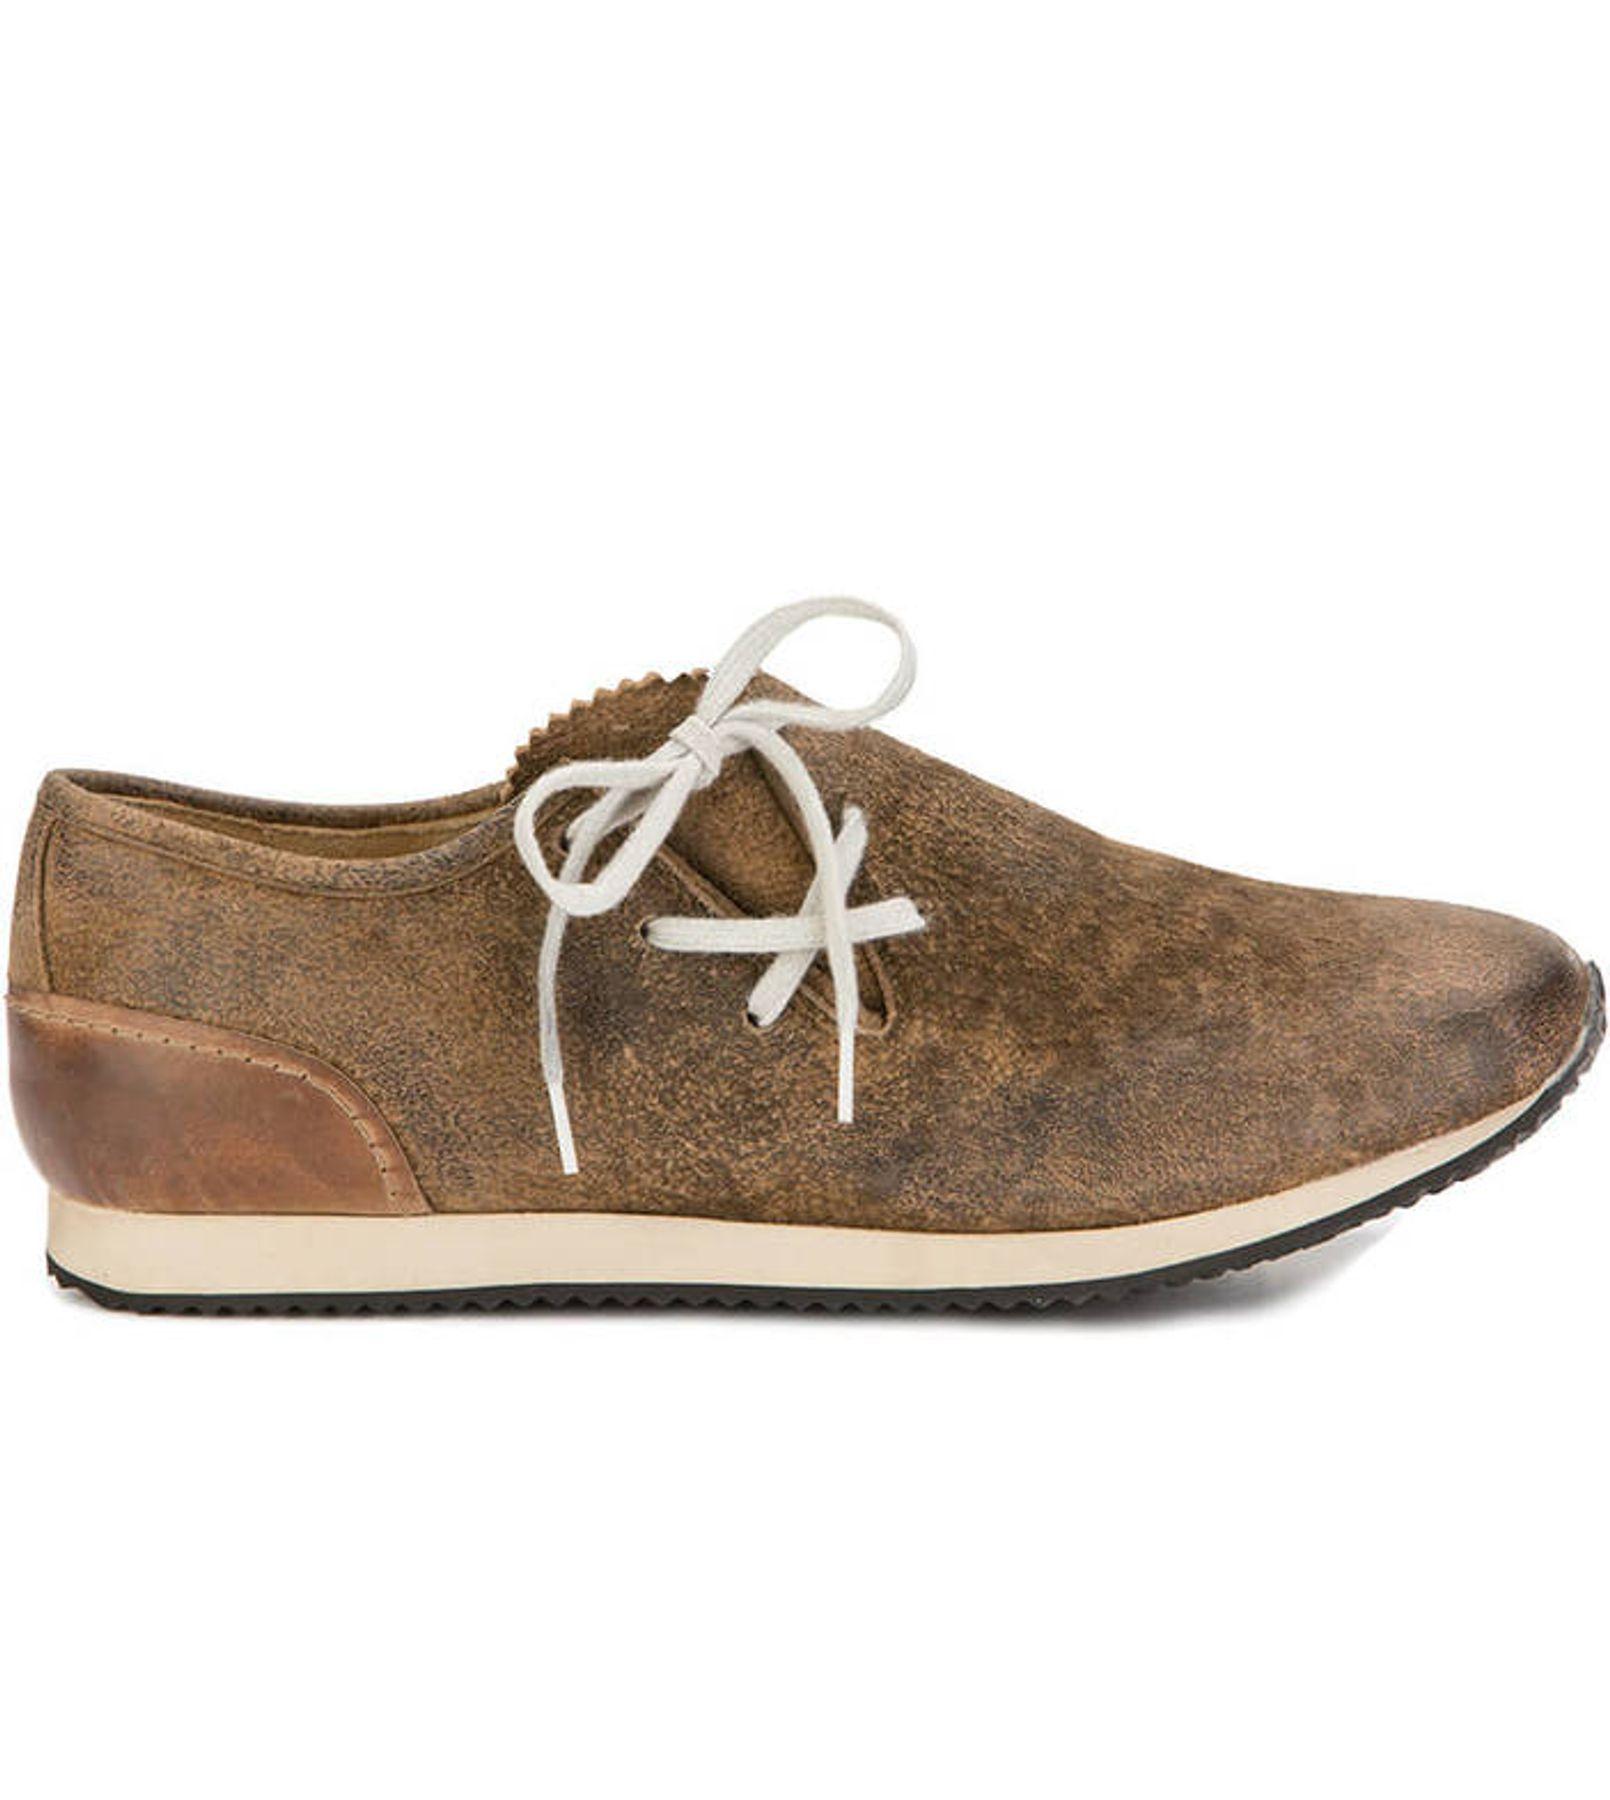 Stockerpoint- Herren Trachten Schuhe in Havanna, 1340 – Bild 2